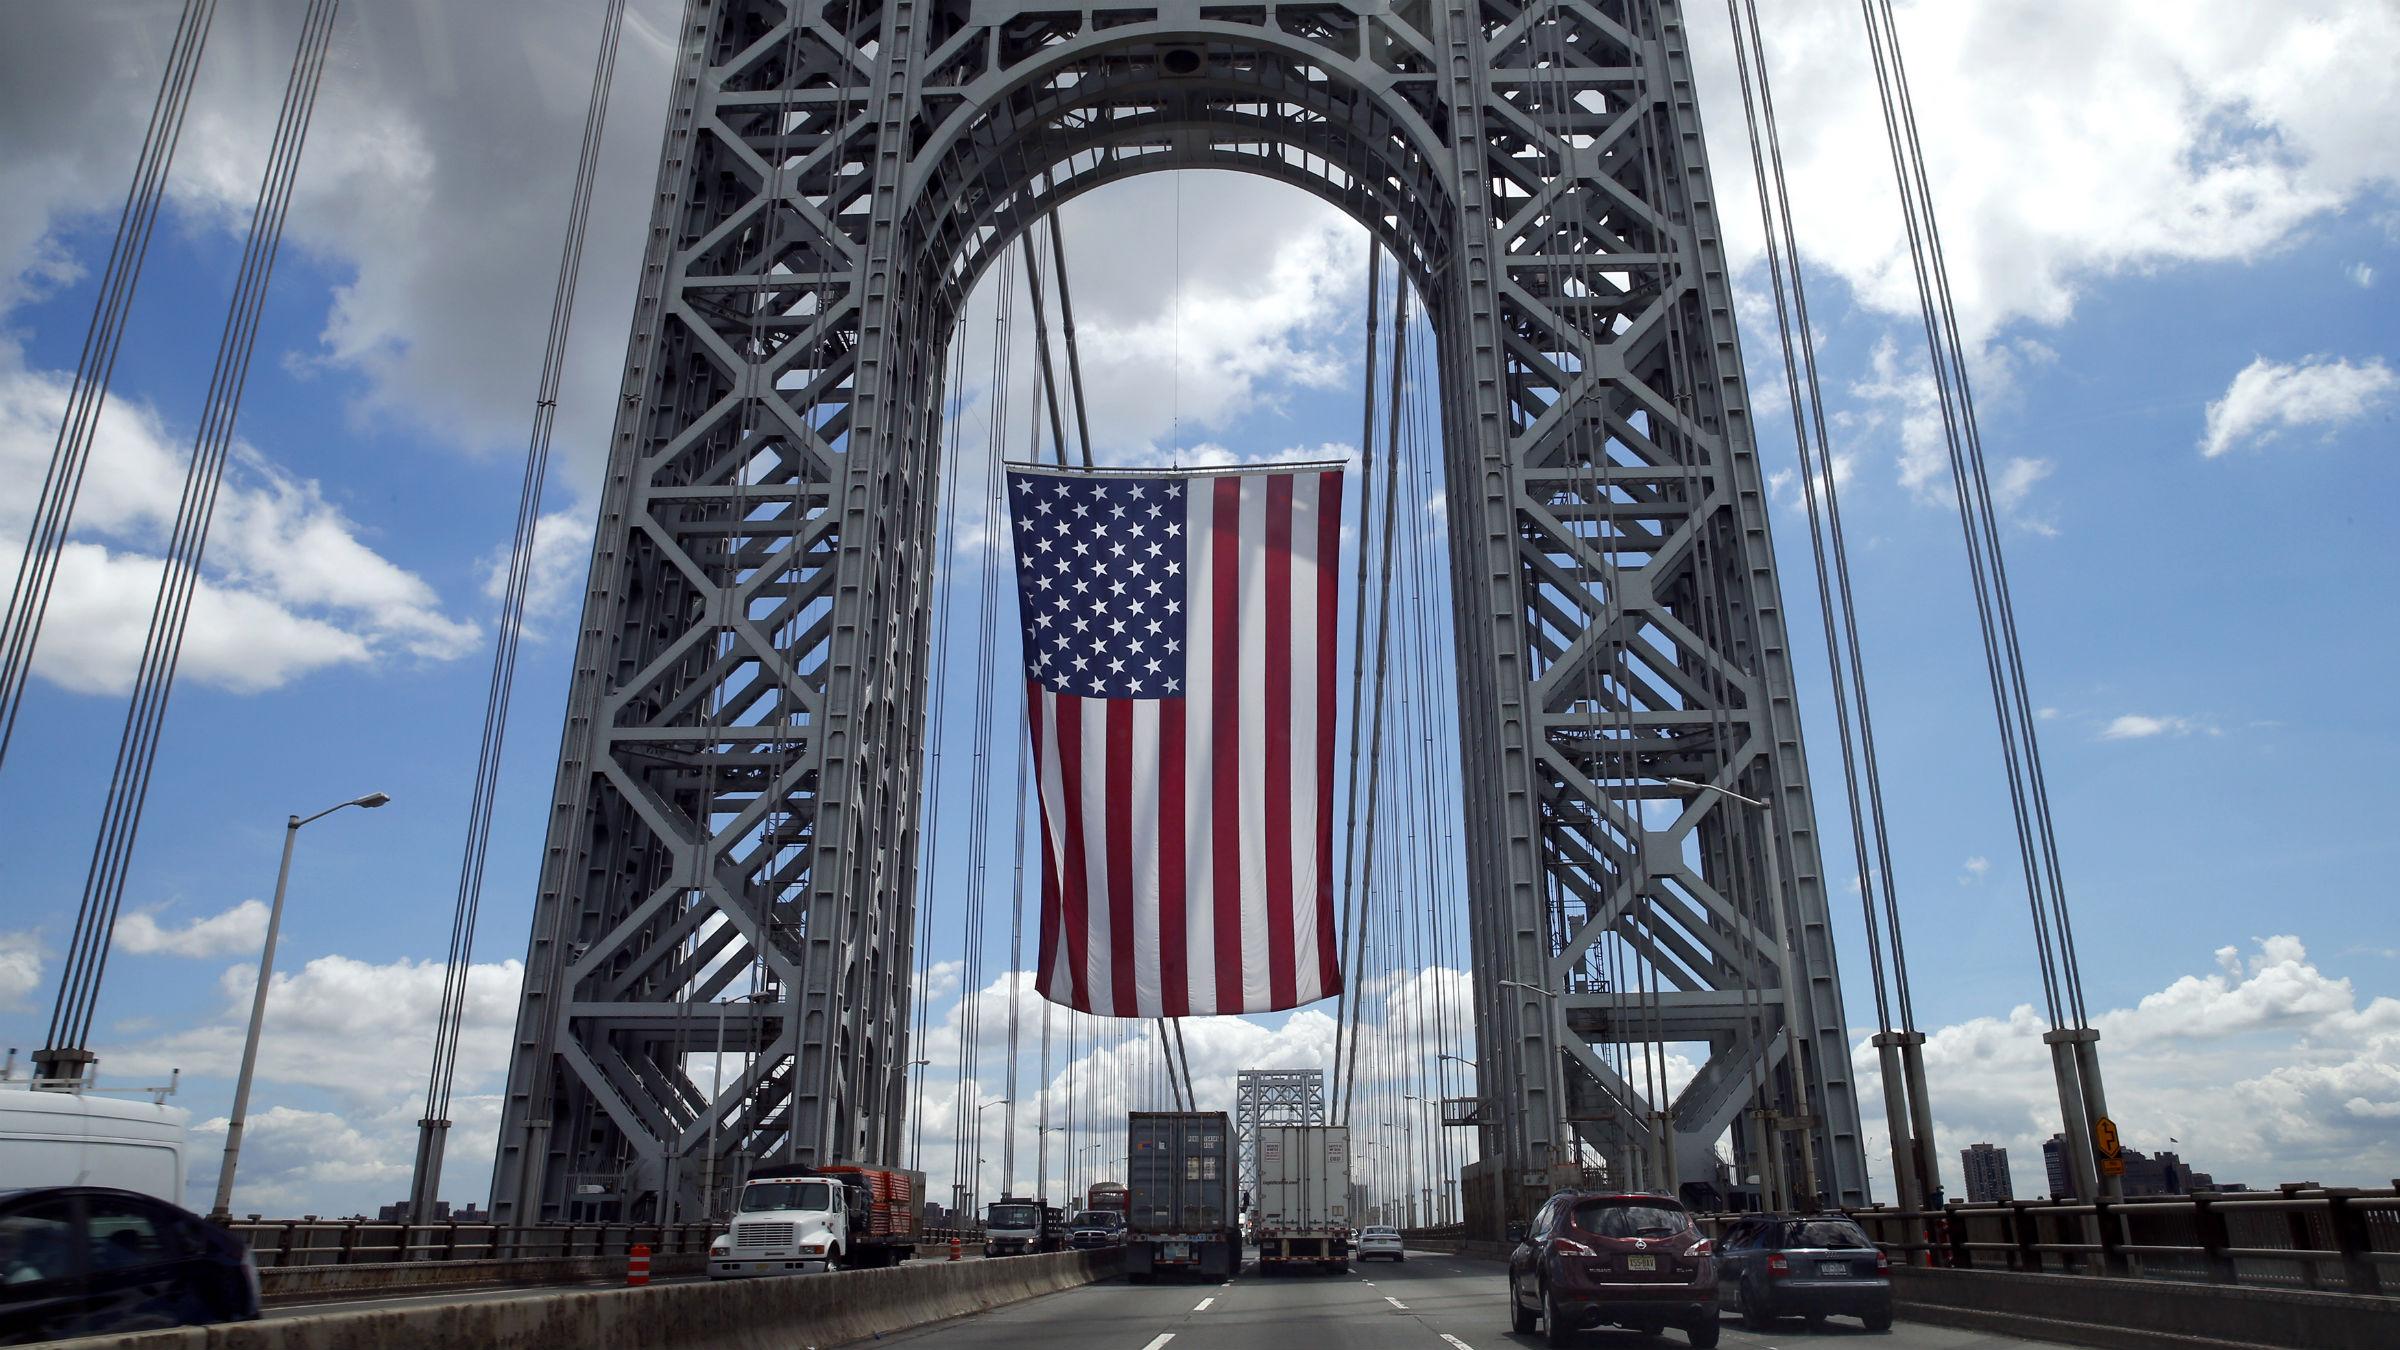 An American flag on George Washington Bridge